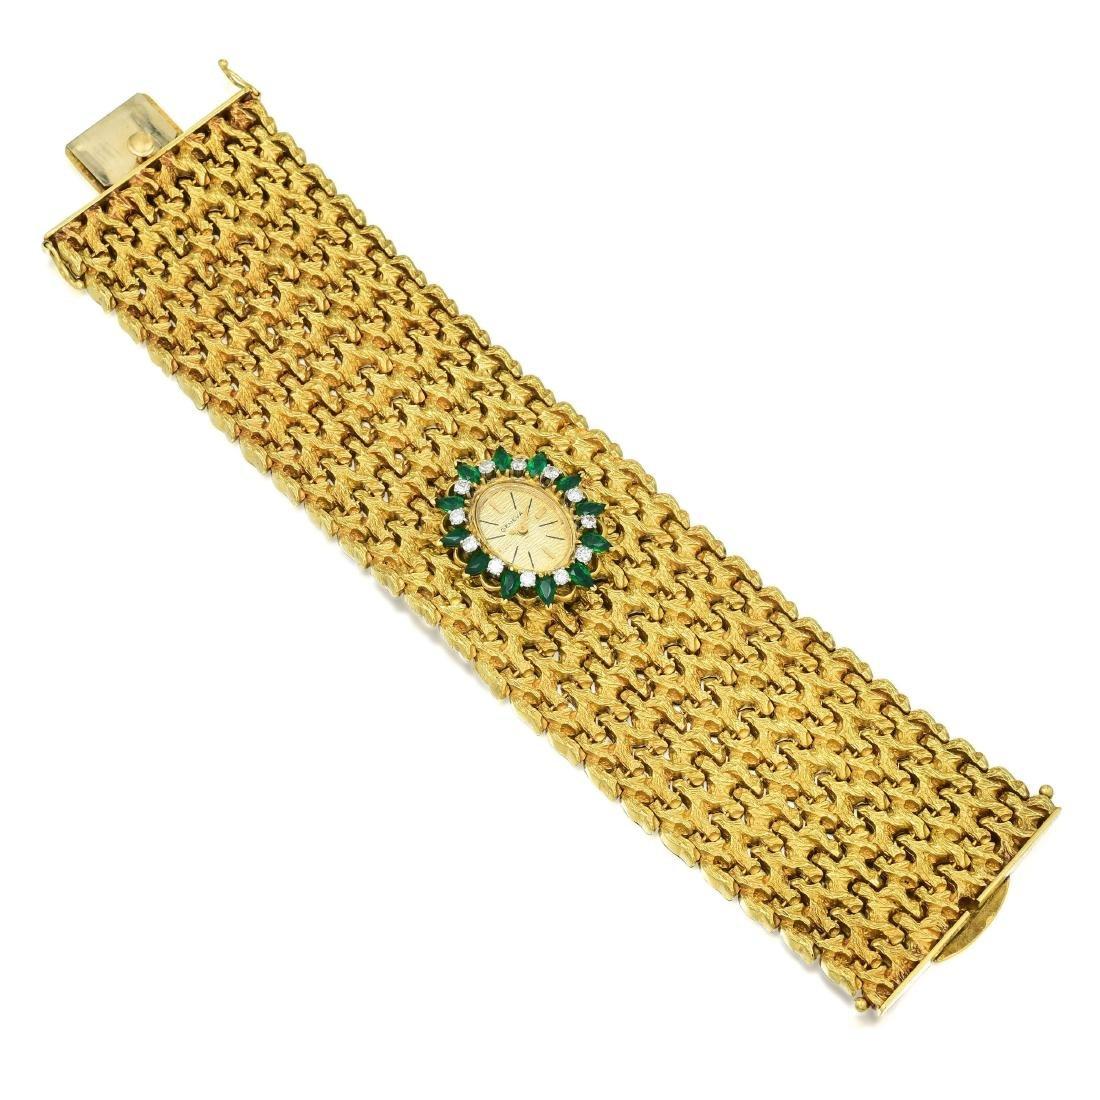 A Wide Emerald and Diamond Watch Bracelet - 2